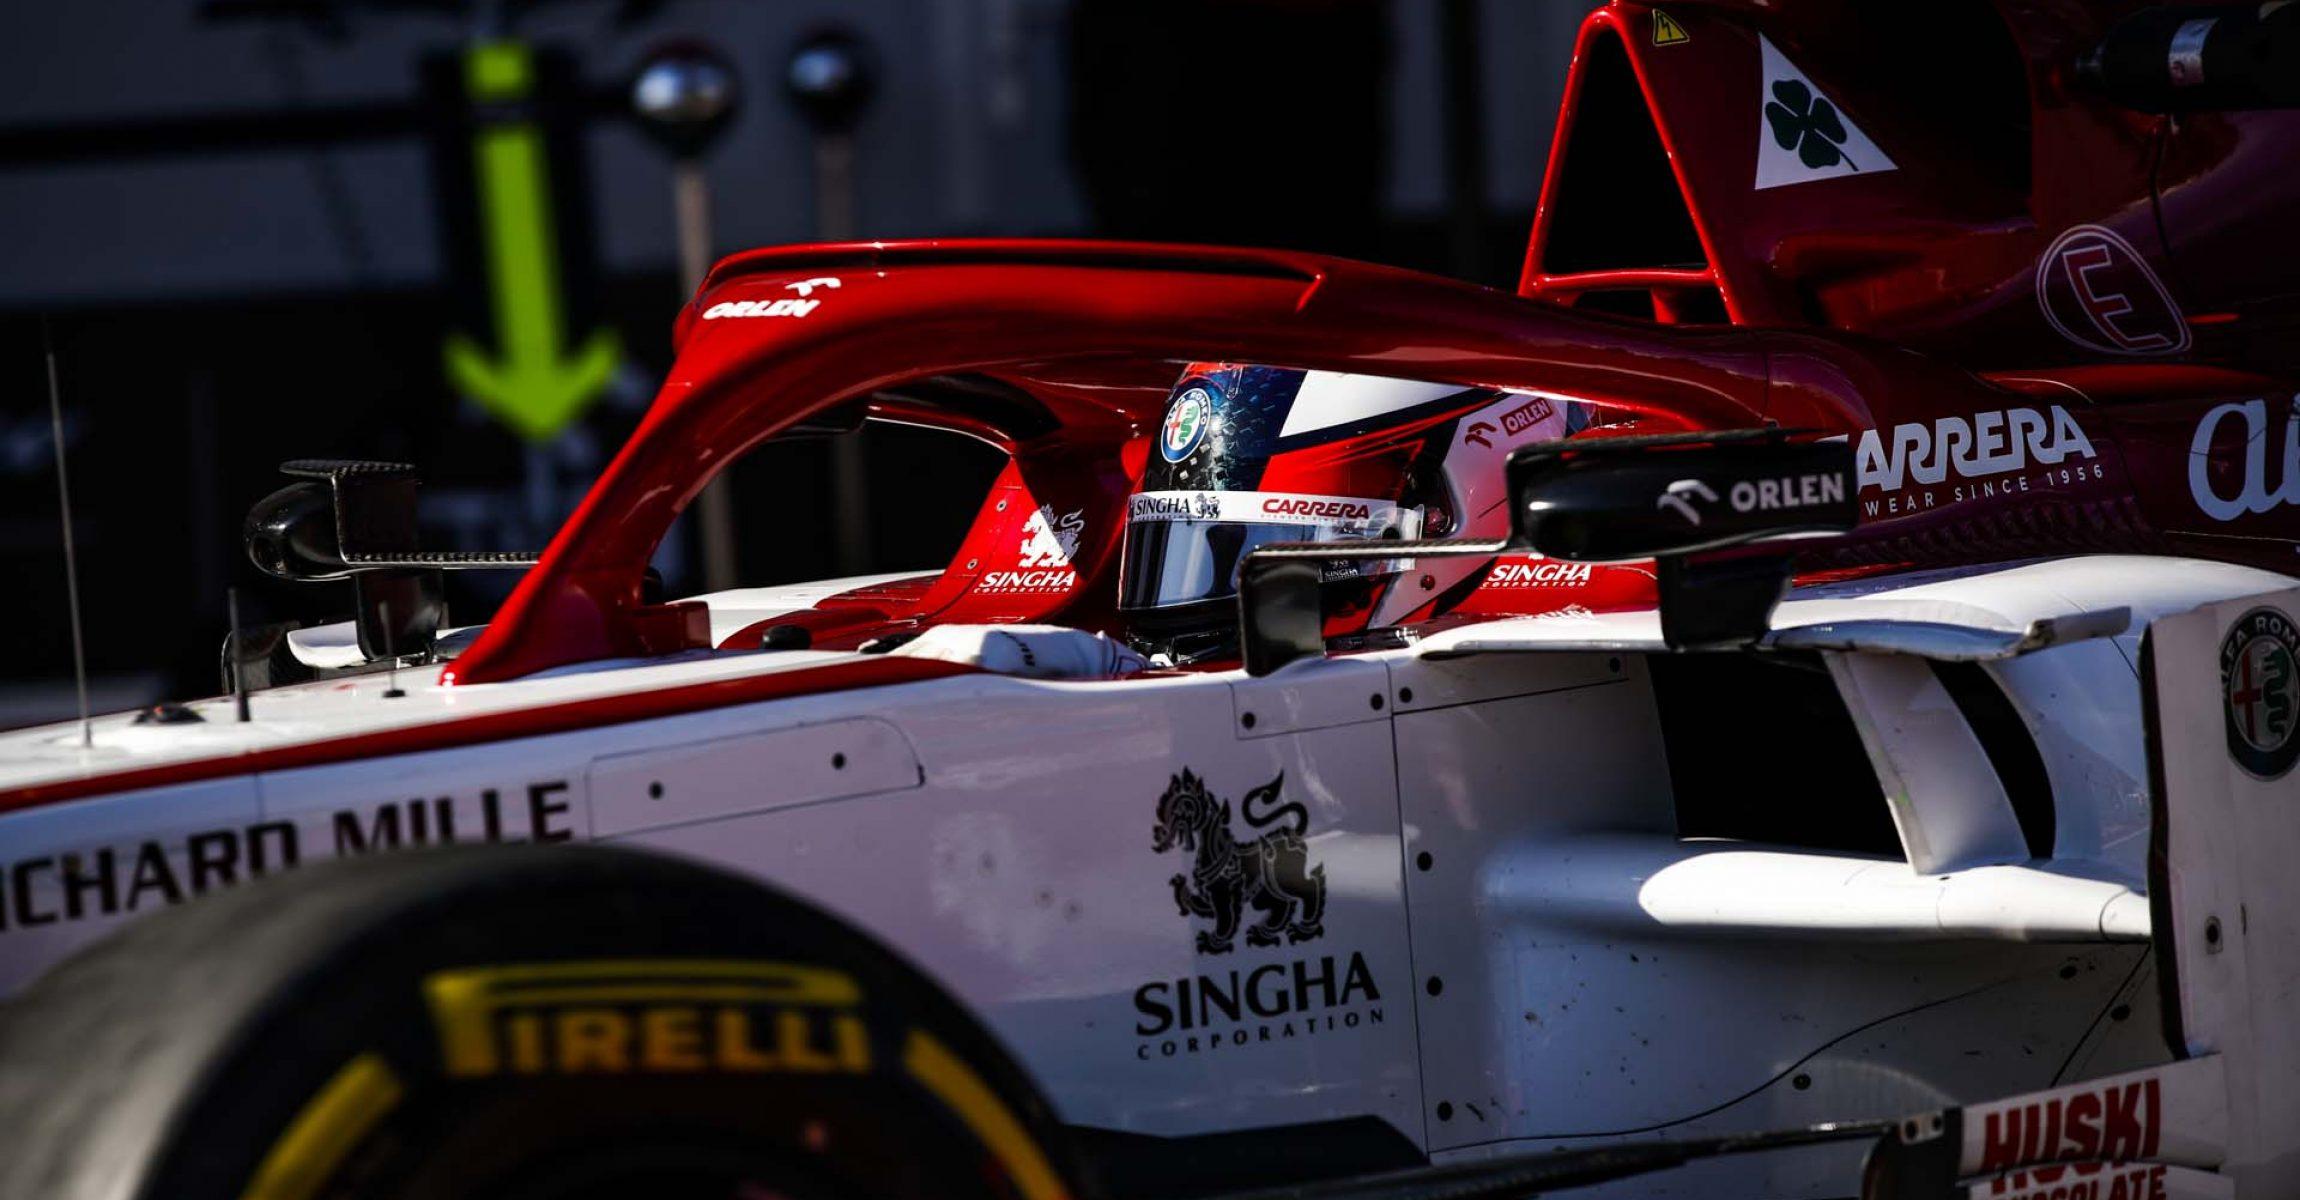 RAIKKONEN Kimi Räikkönen (fin), Alfa Romeo Racing C39, action during the second session of the Formula 1 Pre-season testing 2020 from February 26 to 28, 2020 on the Circuit de Barcelona-Catalunya, in Montmelo, Barcelona, Spain - Photo Florent Gooden / DPPI